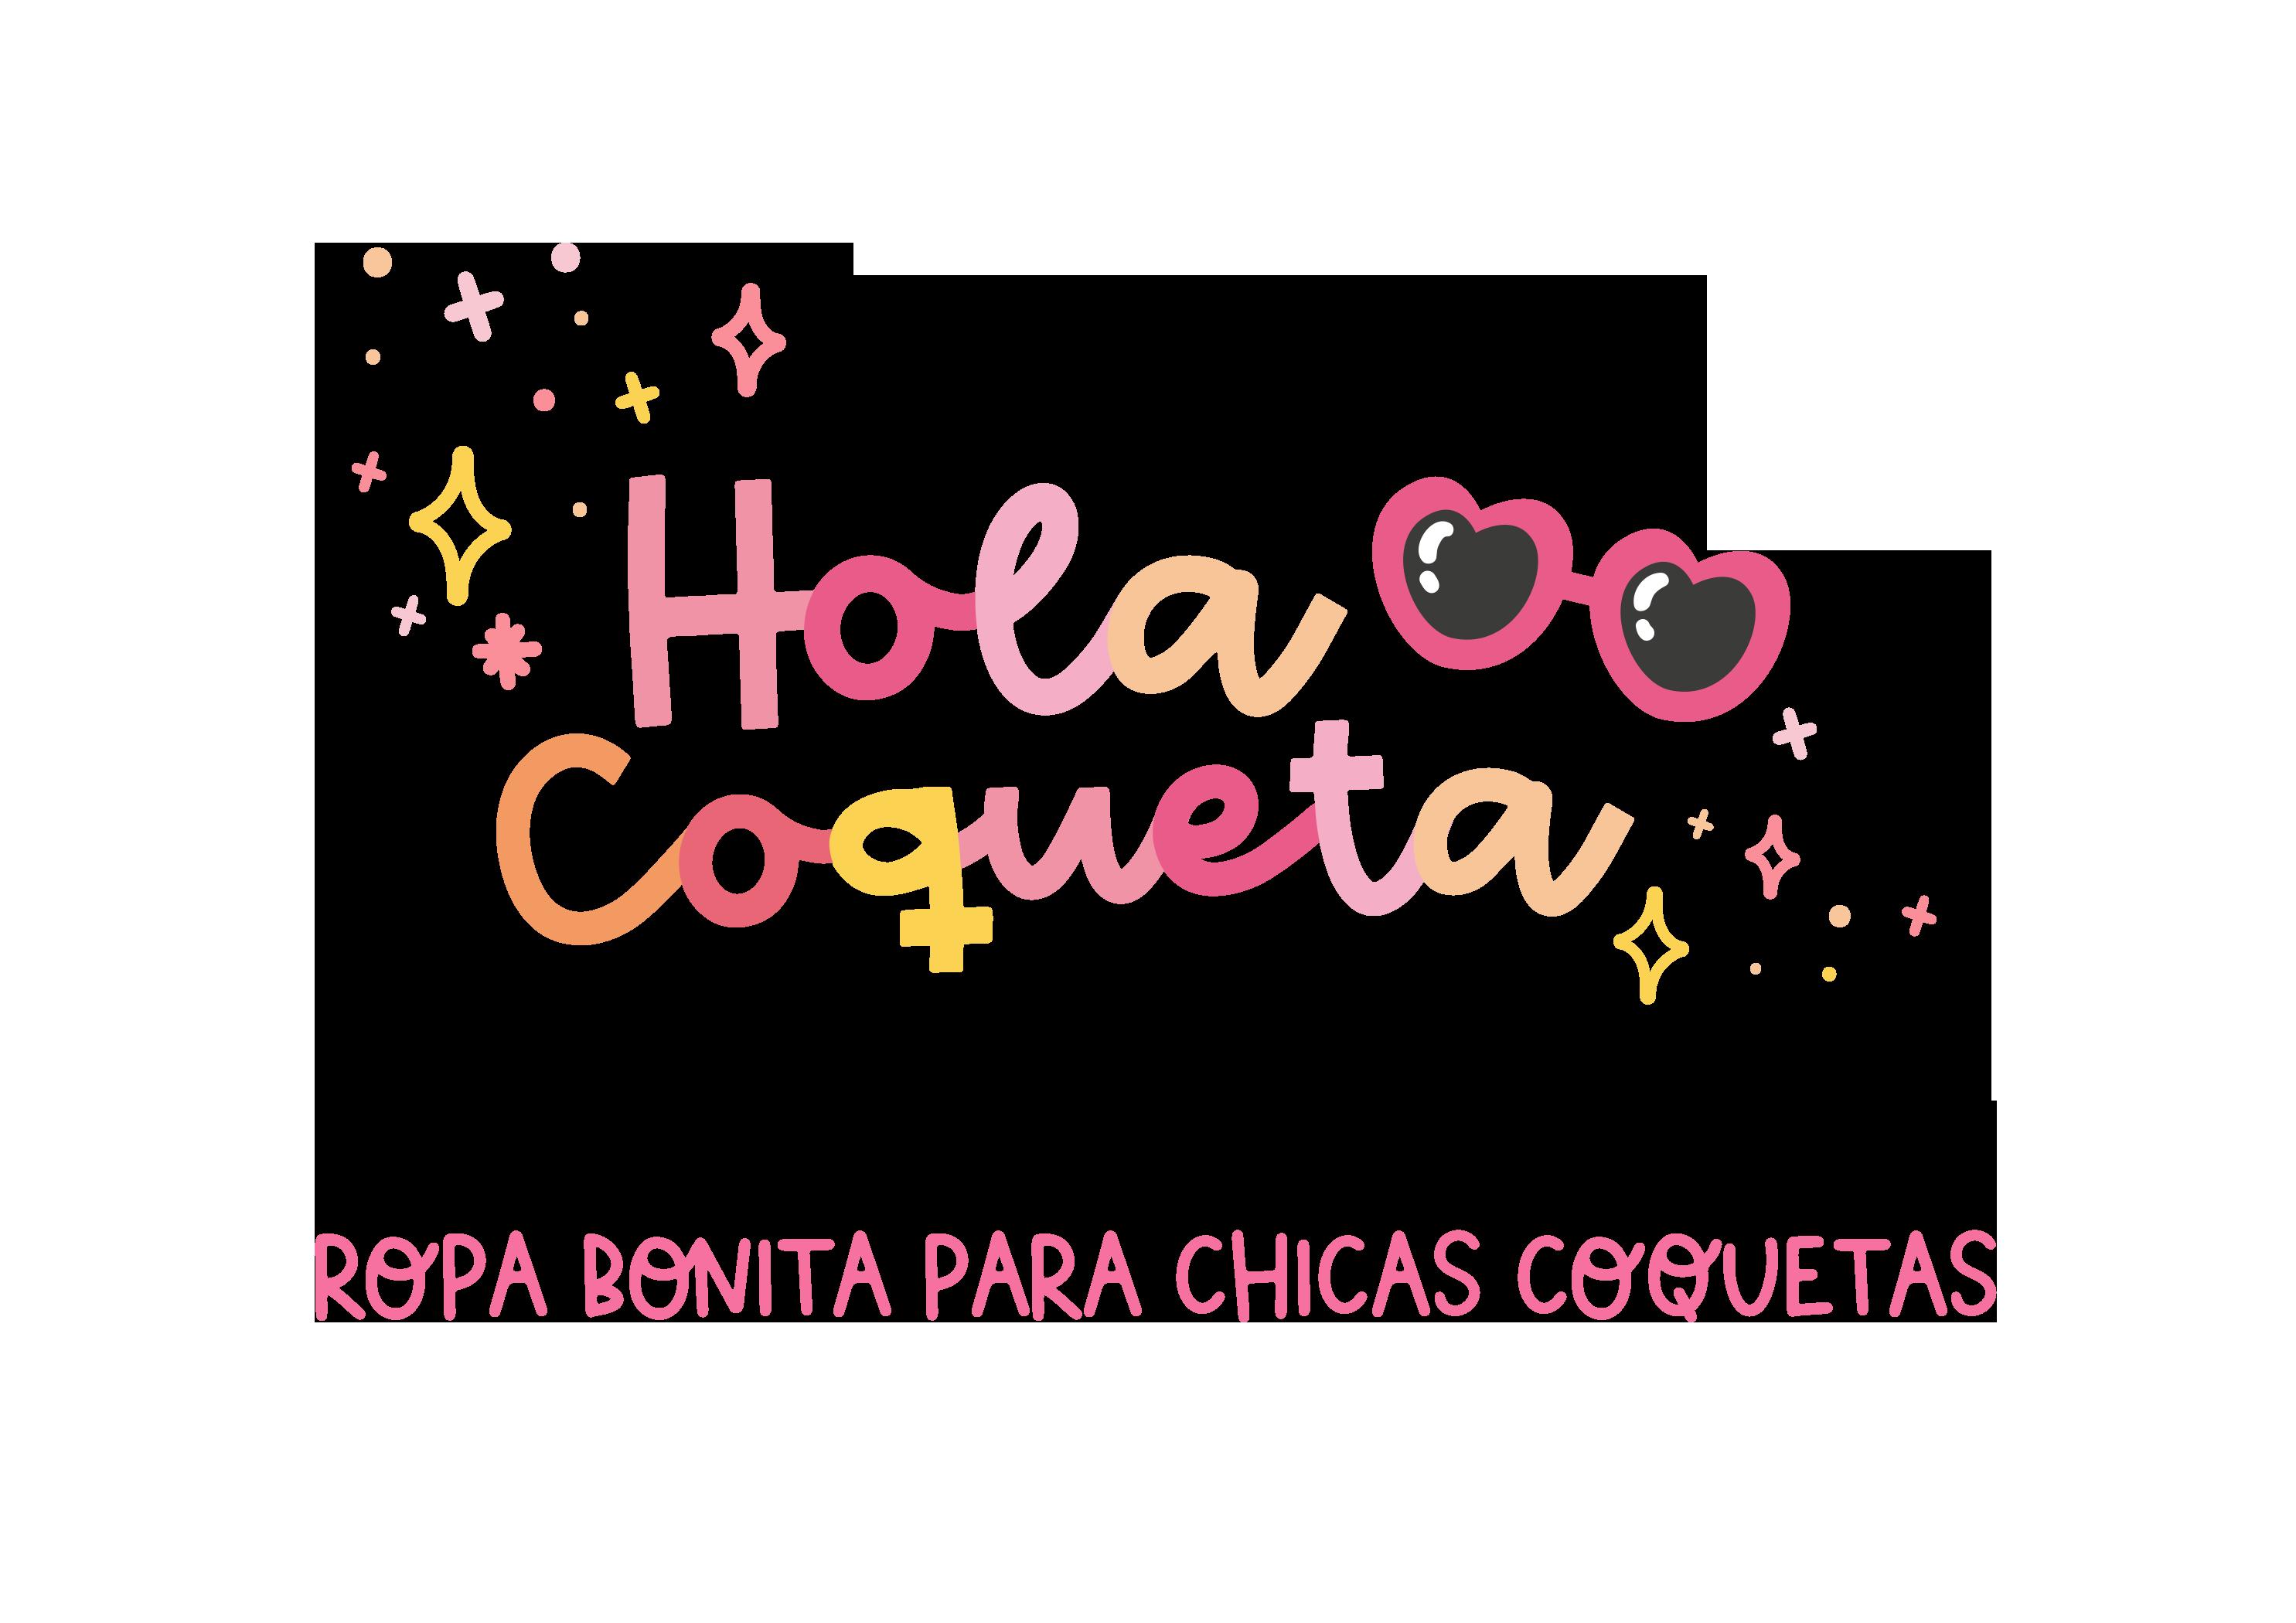 Hola Coqueta